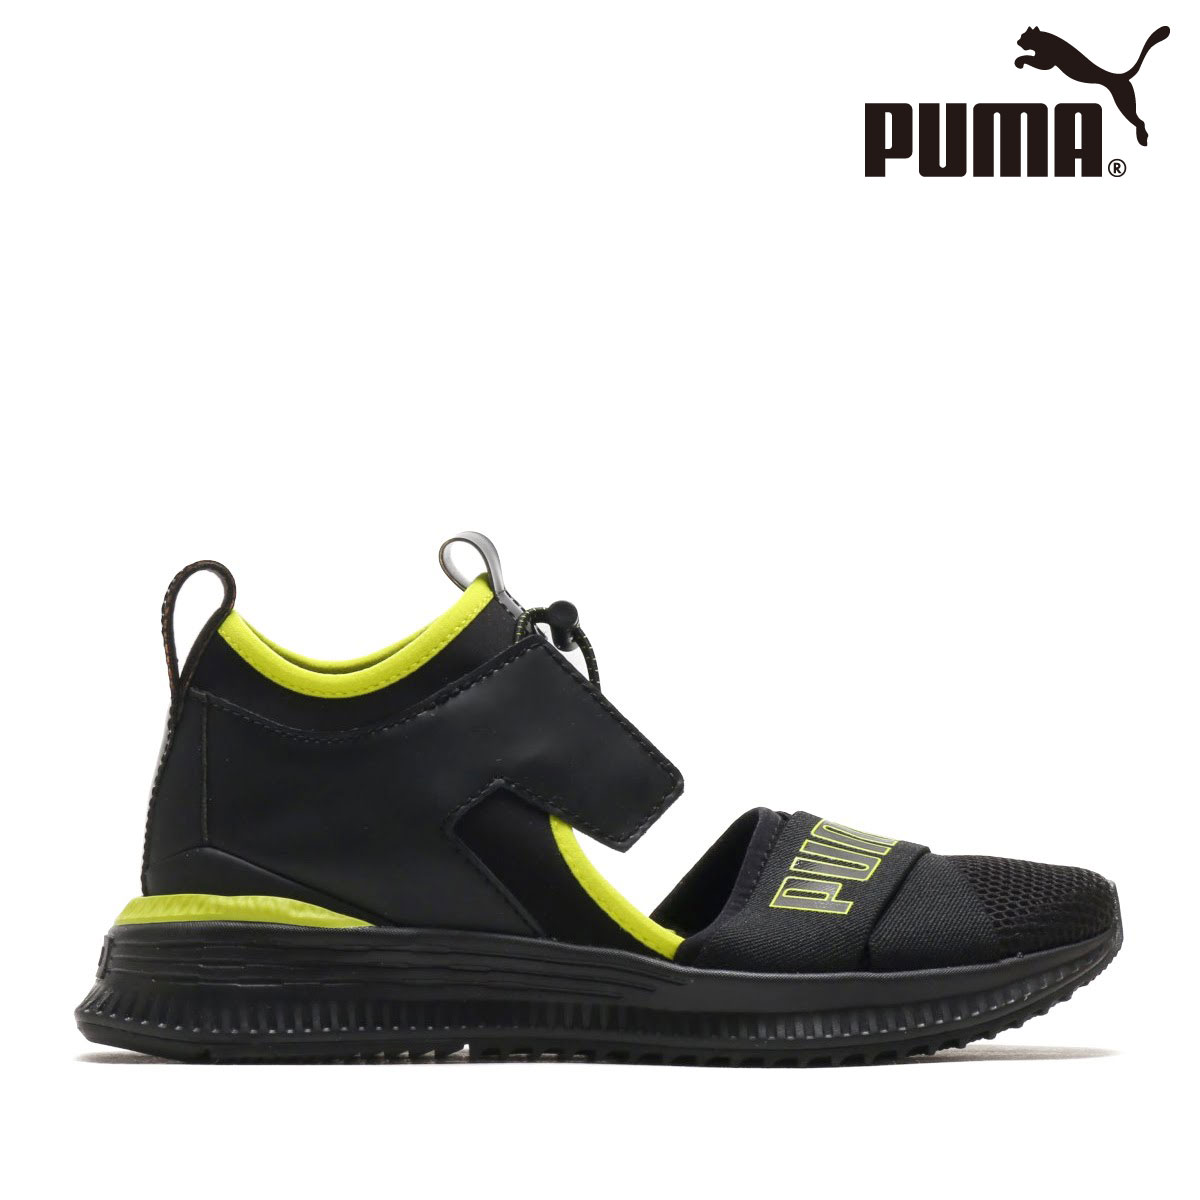 PUMA FENTY AVID(PUMA BLACK-LI)(プーマ フェンティ アビッド)【レディースサイズ】【スニーカー】【リアーナ】【18SU-I】